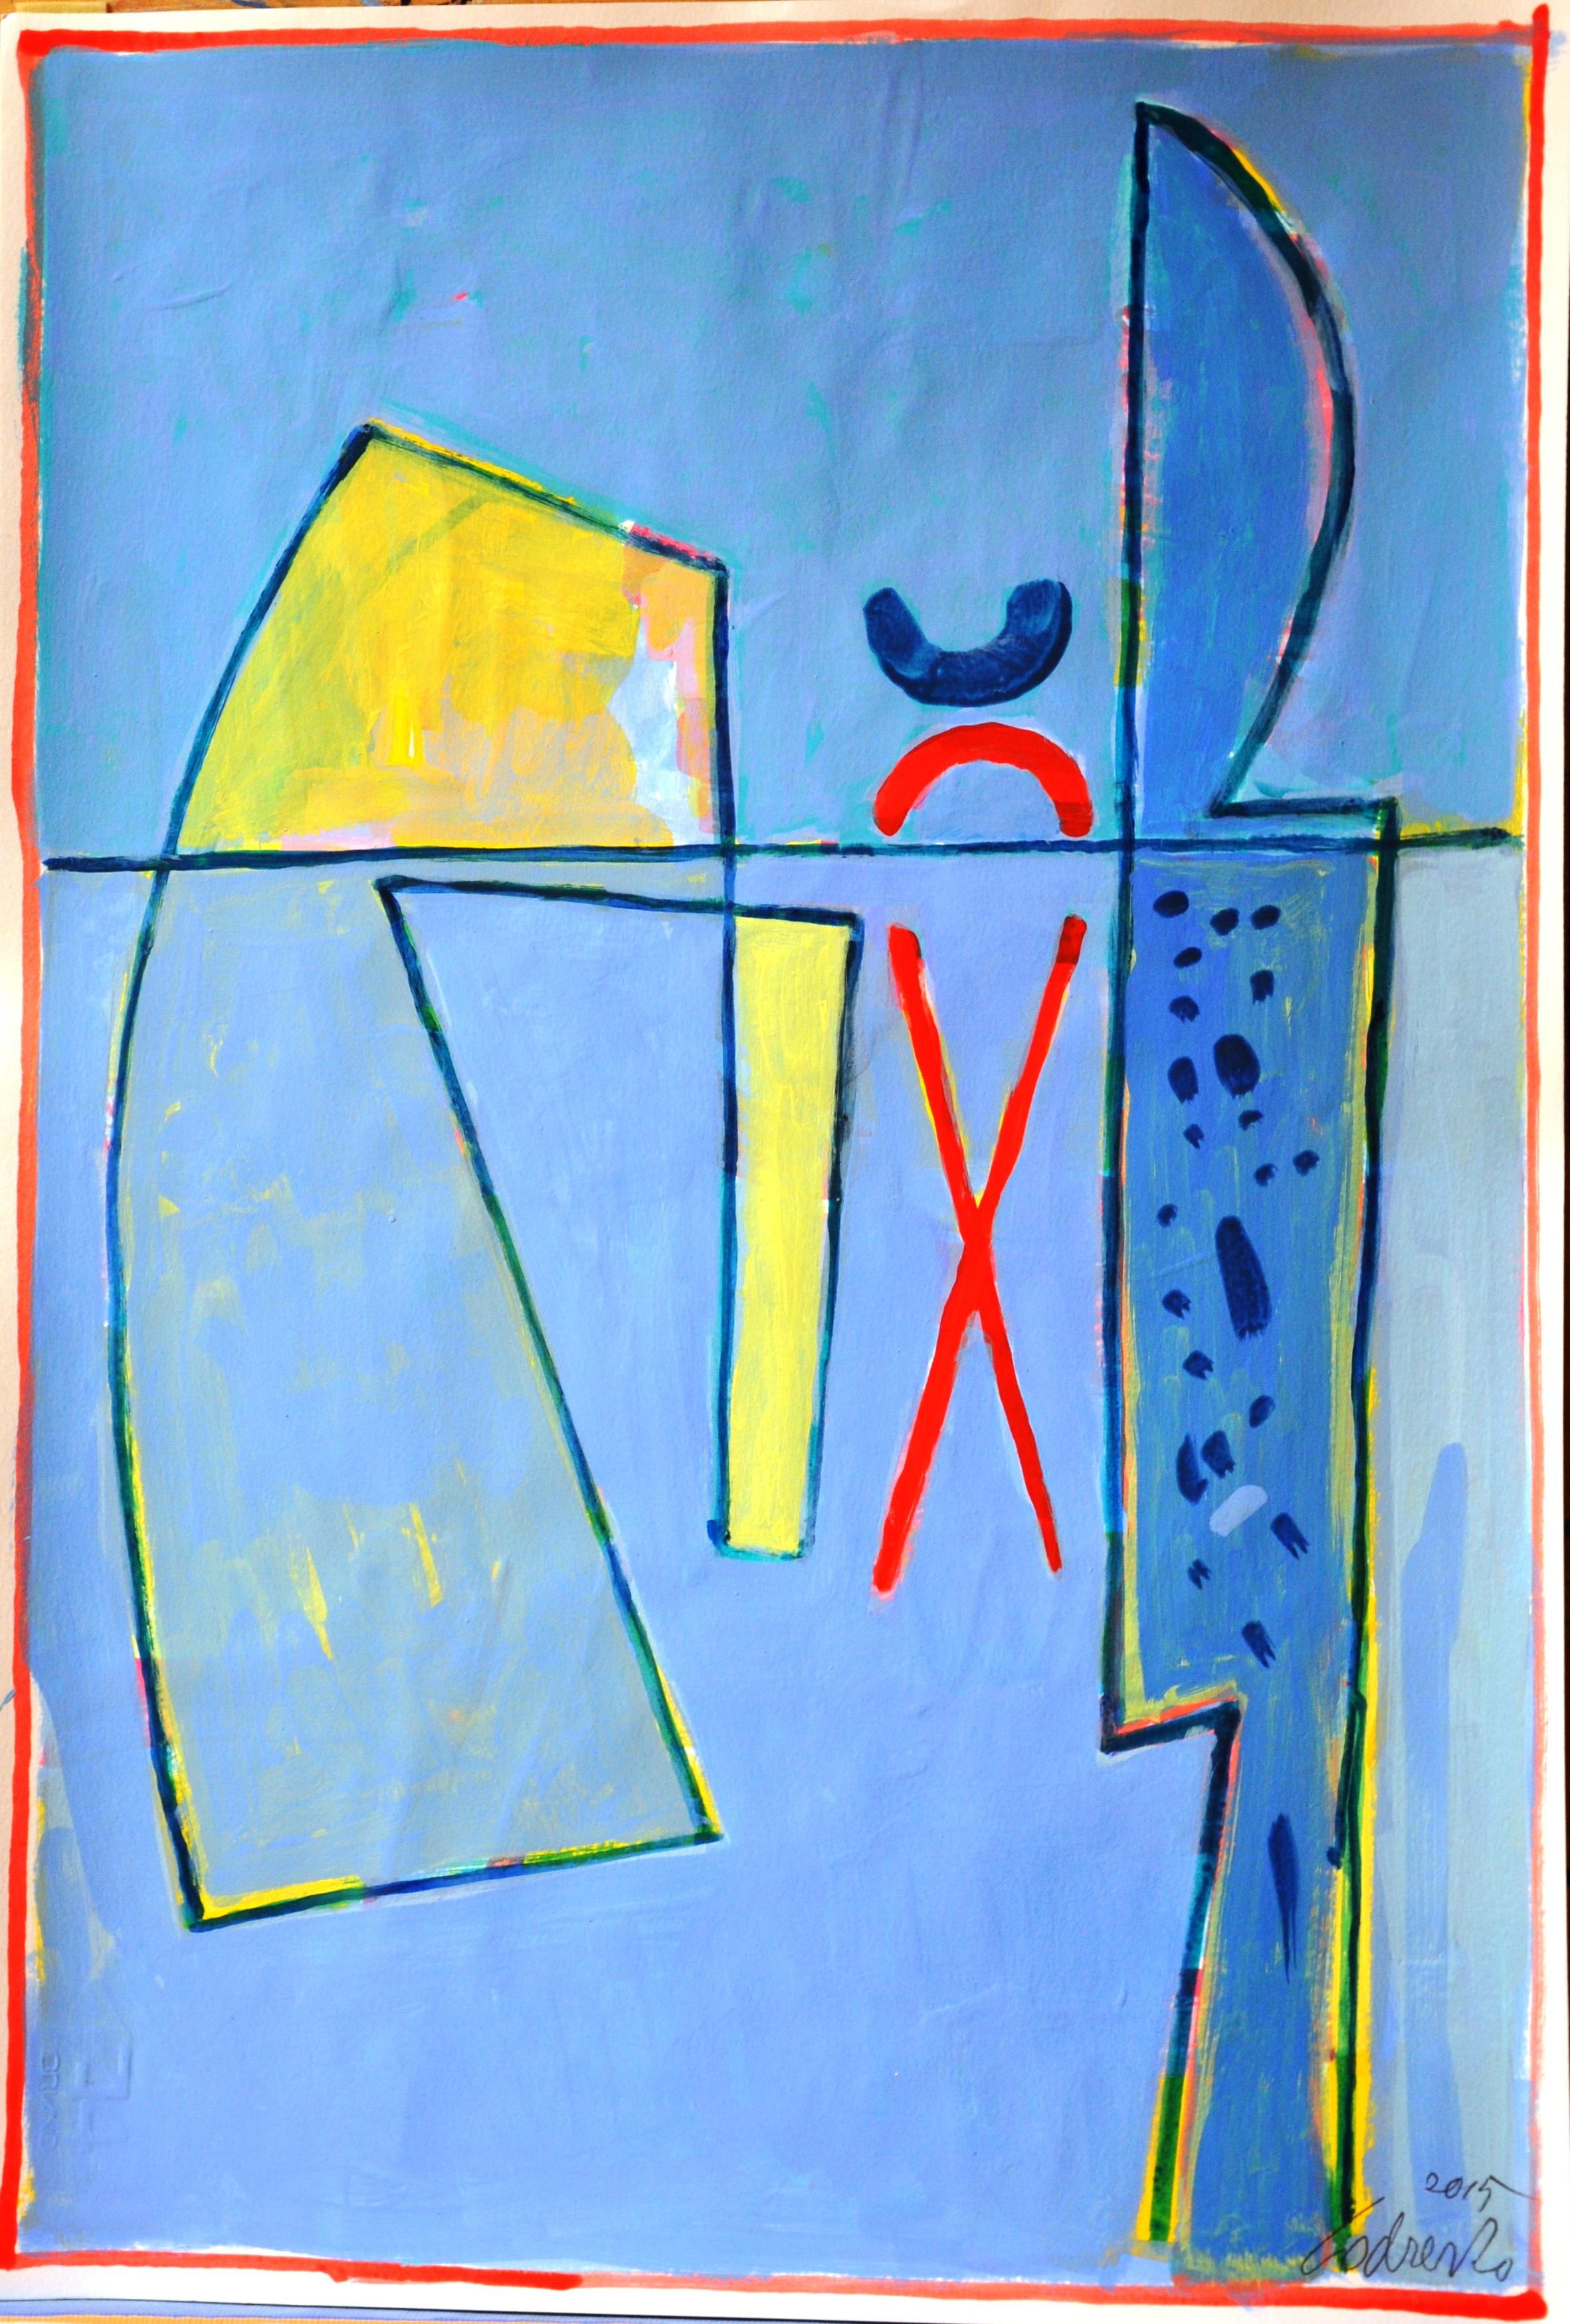 Confine, acrilico, 2015, cm 46x31